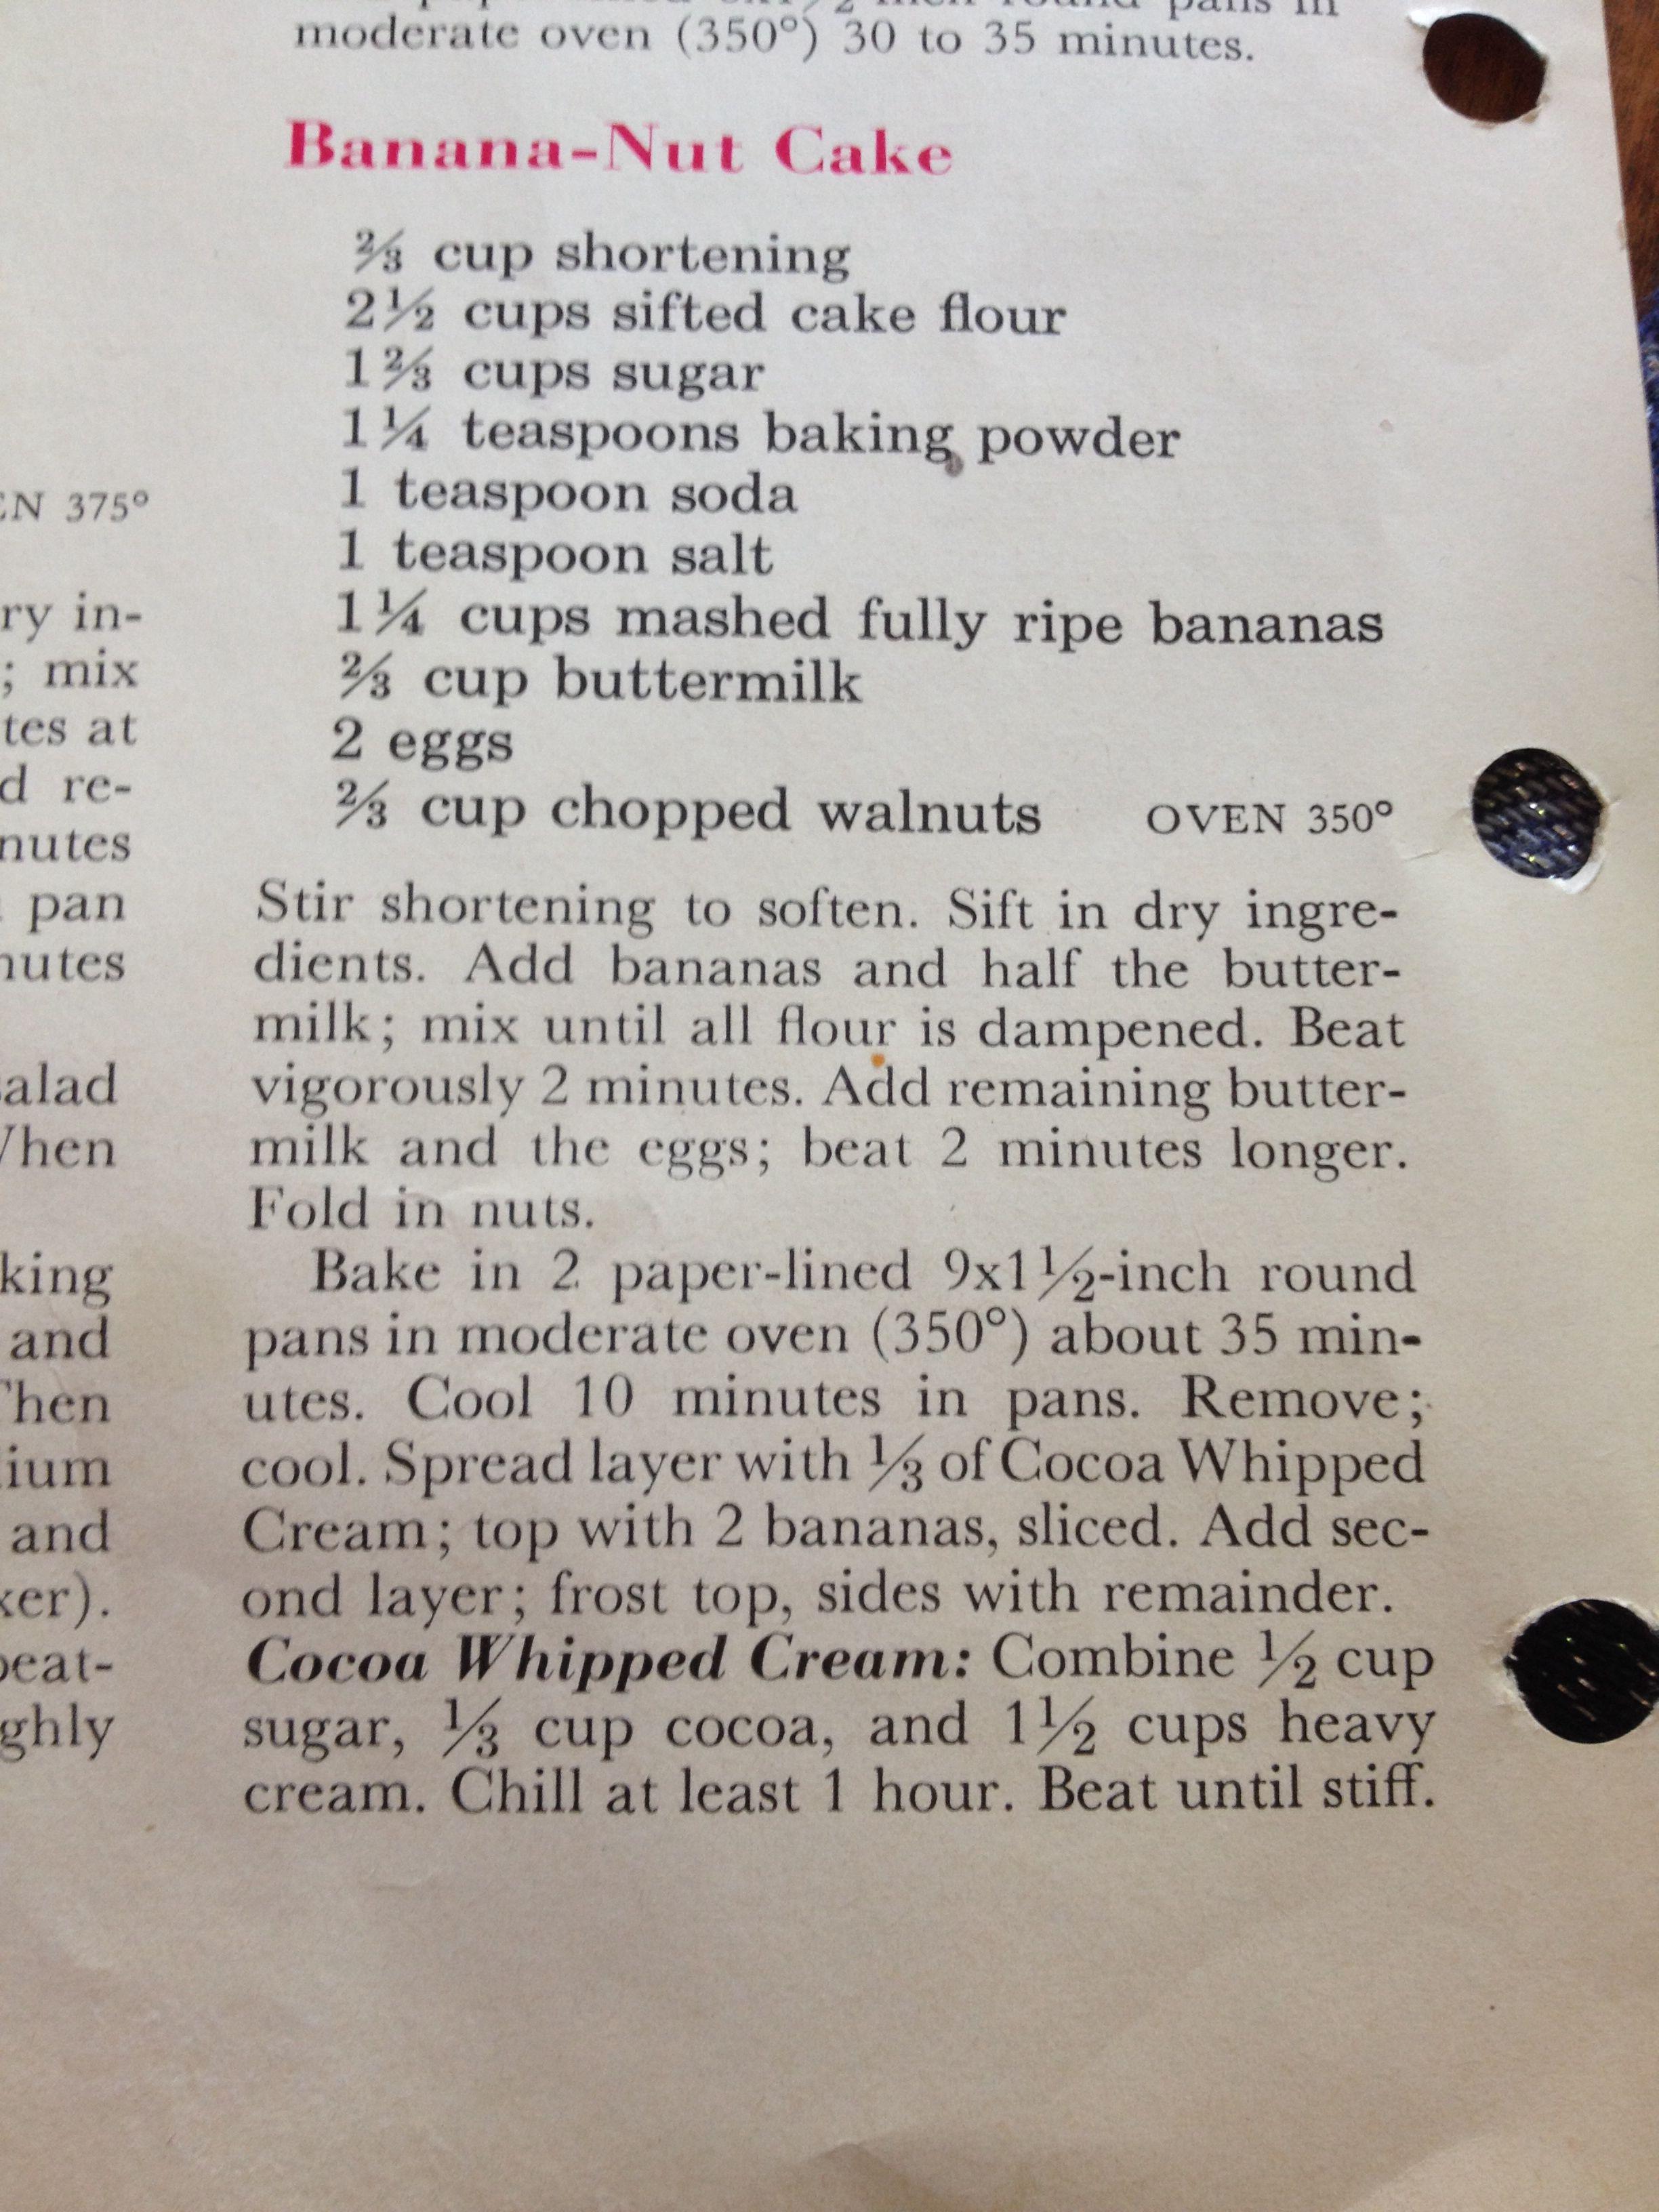 Banananut cake from betty crocker cook book banana nut